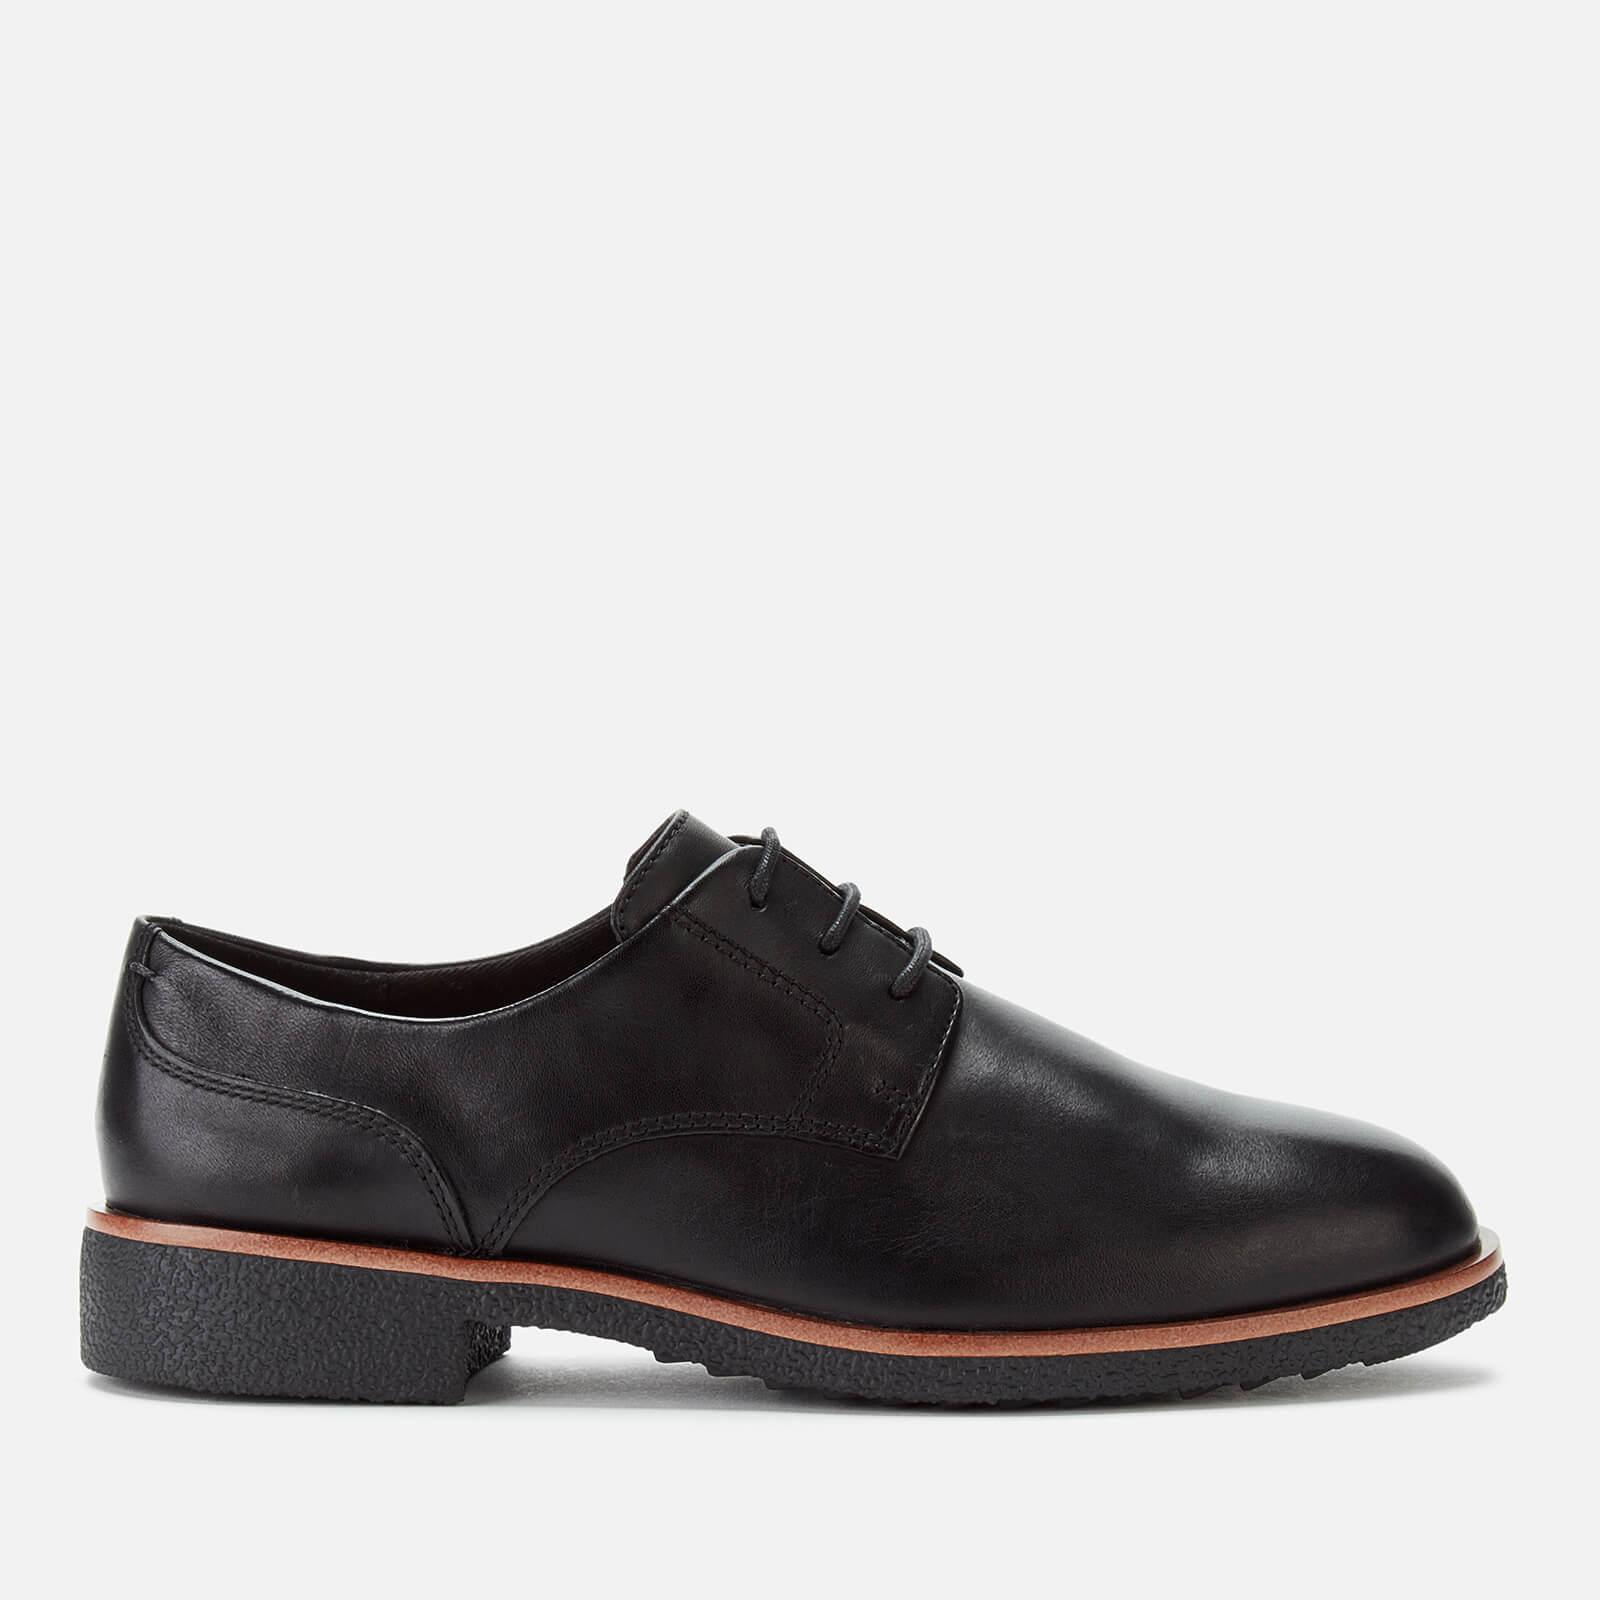 Clarks Women's Griffin Lane Leather Derby Shoes - Black - UK 6